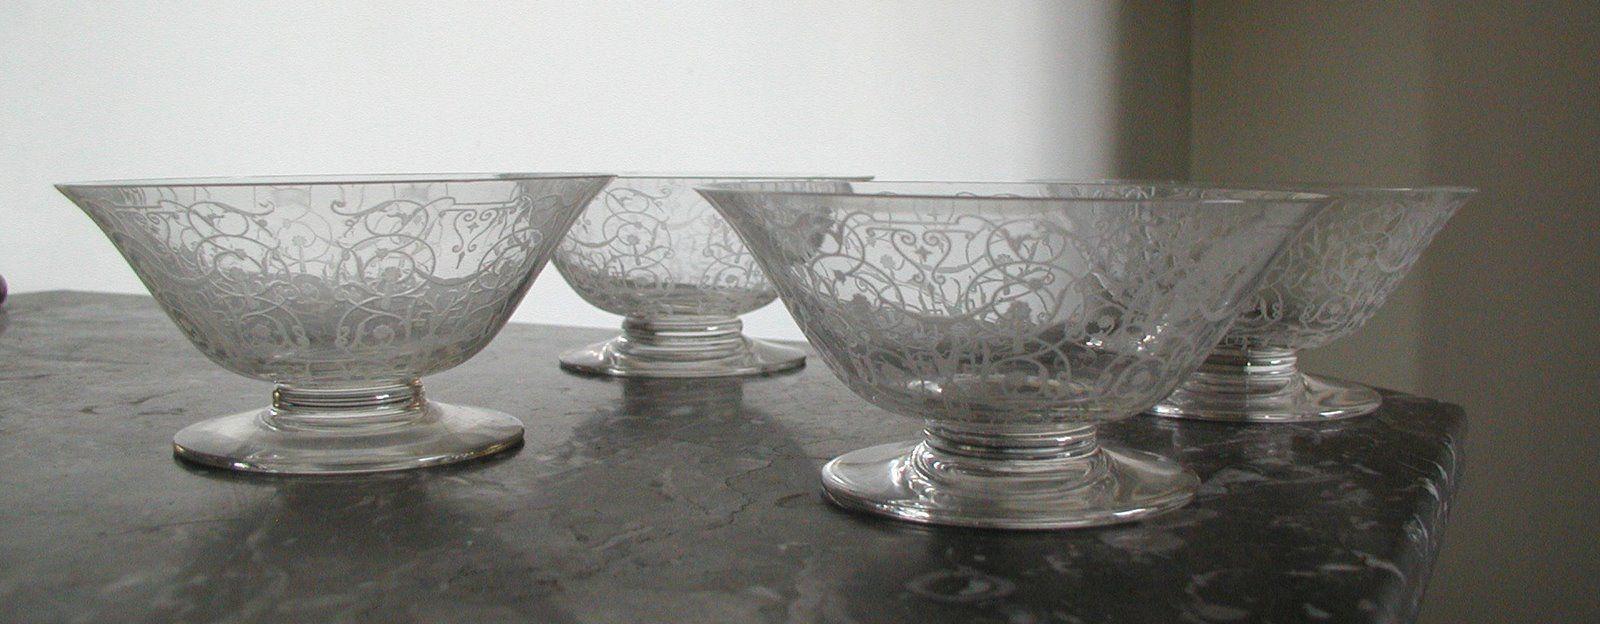 Coupe à Champagne:Michel-Angelo:Baccarat   ーAntique Glasswareー ...